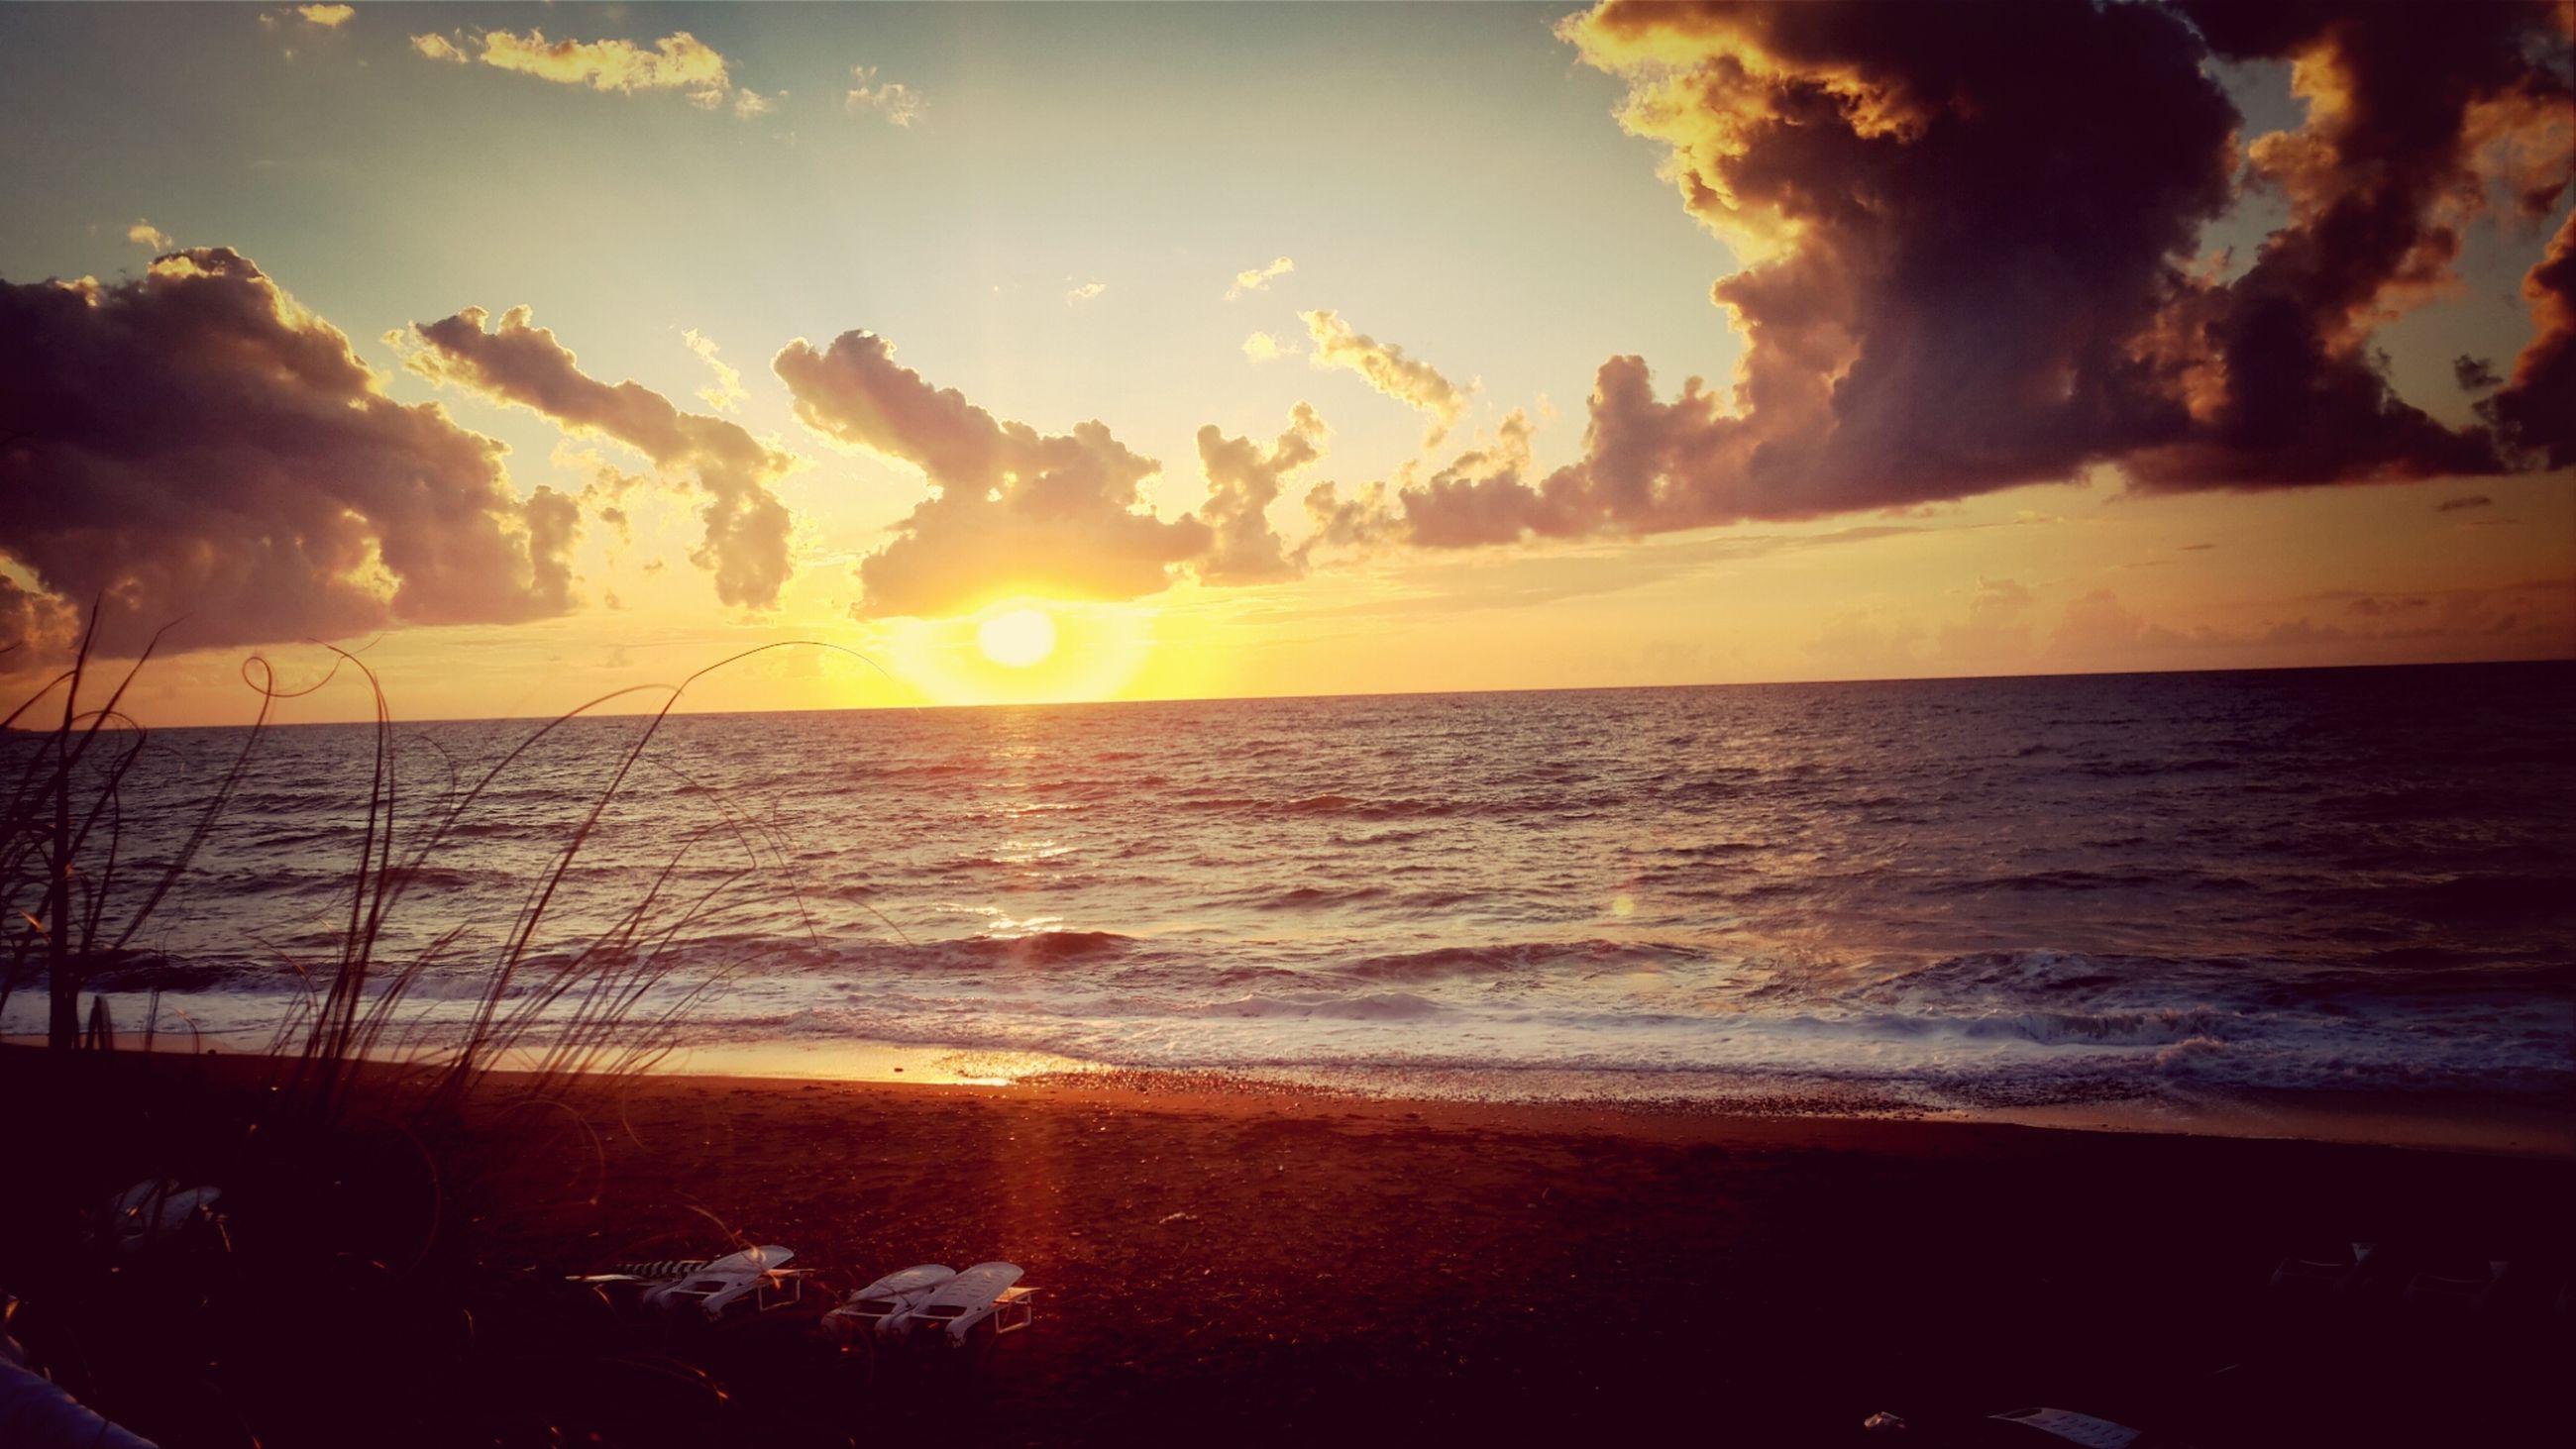 sea, horizon over water, sunset, water, beach, sky, scenics, shore, tranquil scene, beauty in nature, sun, tranquility, cloud - sky, orange color, nature, idyllic, reflection, sunlight, cloud, sunbeam